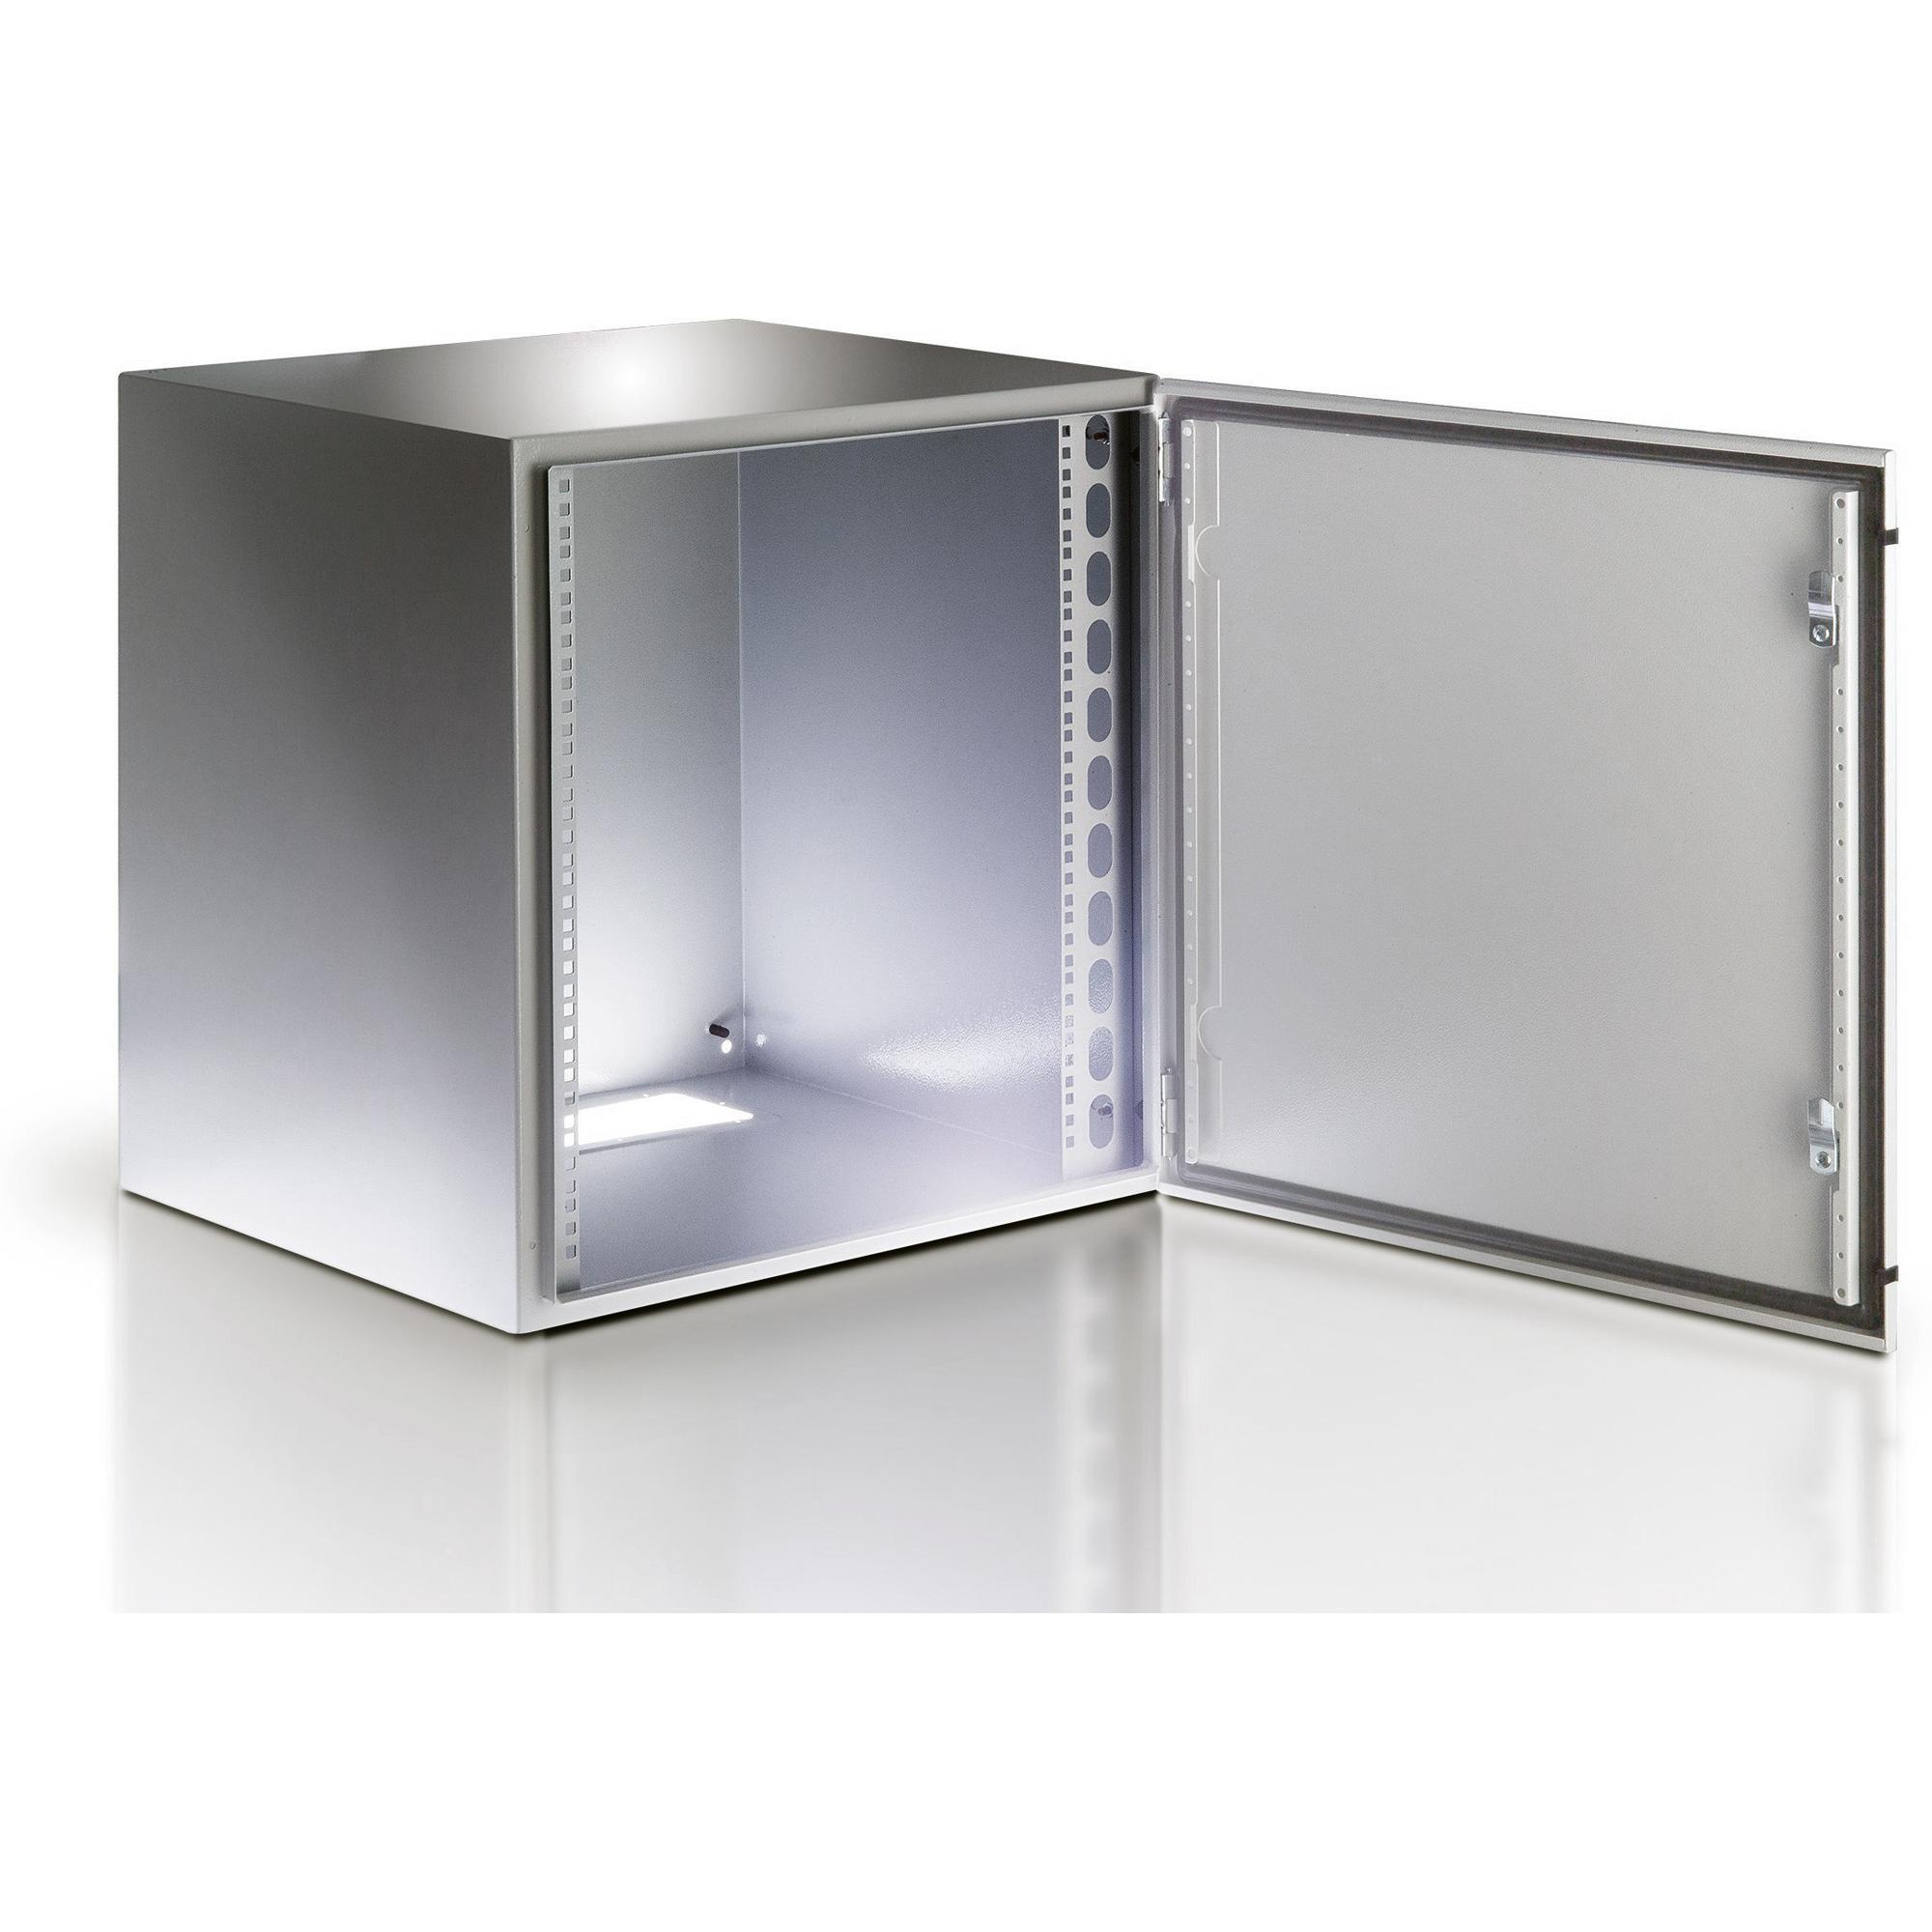 Armadio Rack 19'' a muro 17U grigio IP65 porta vetro